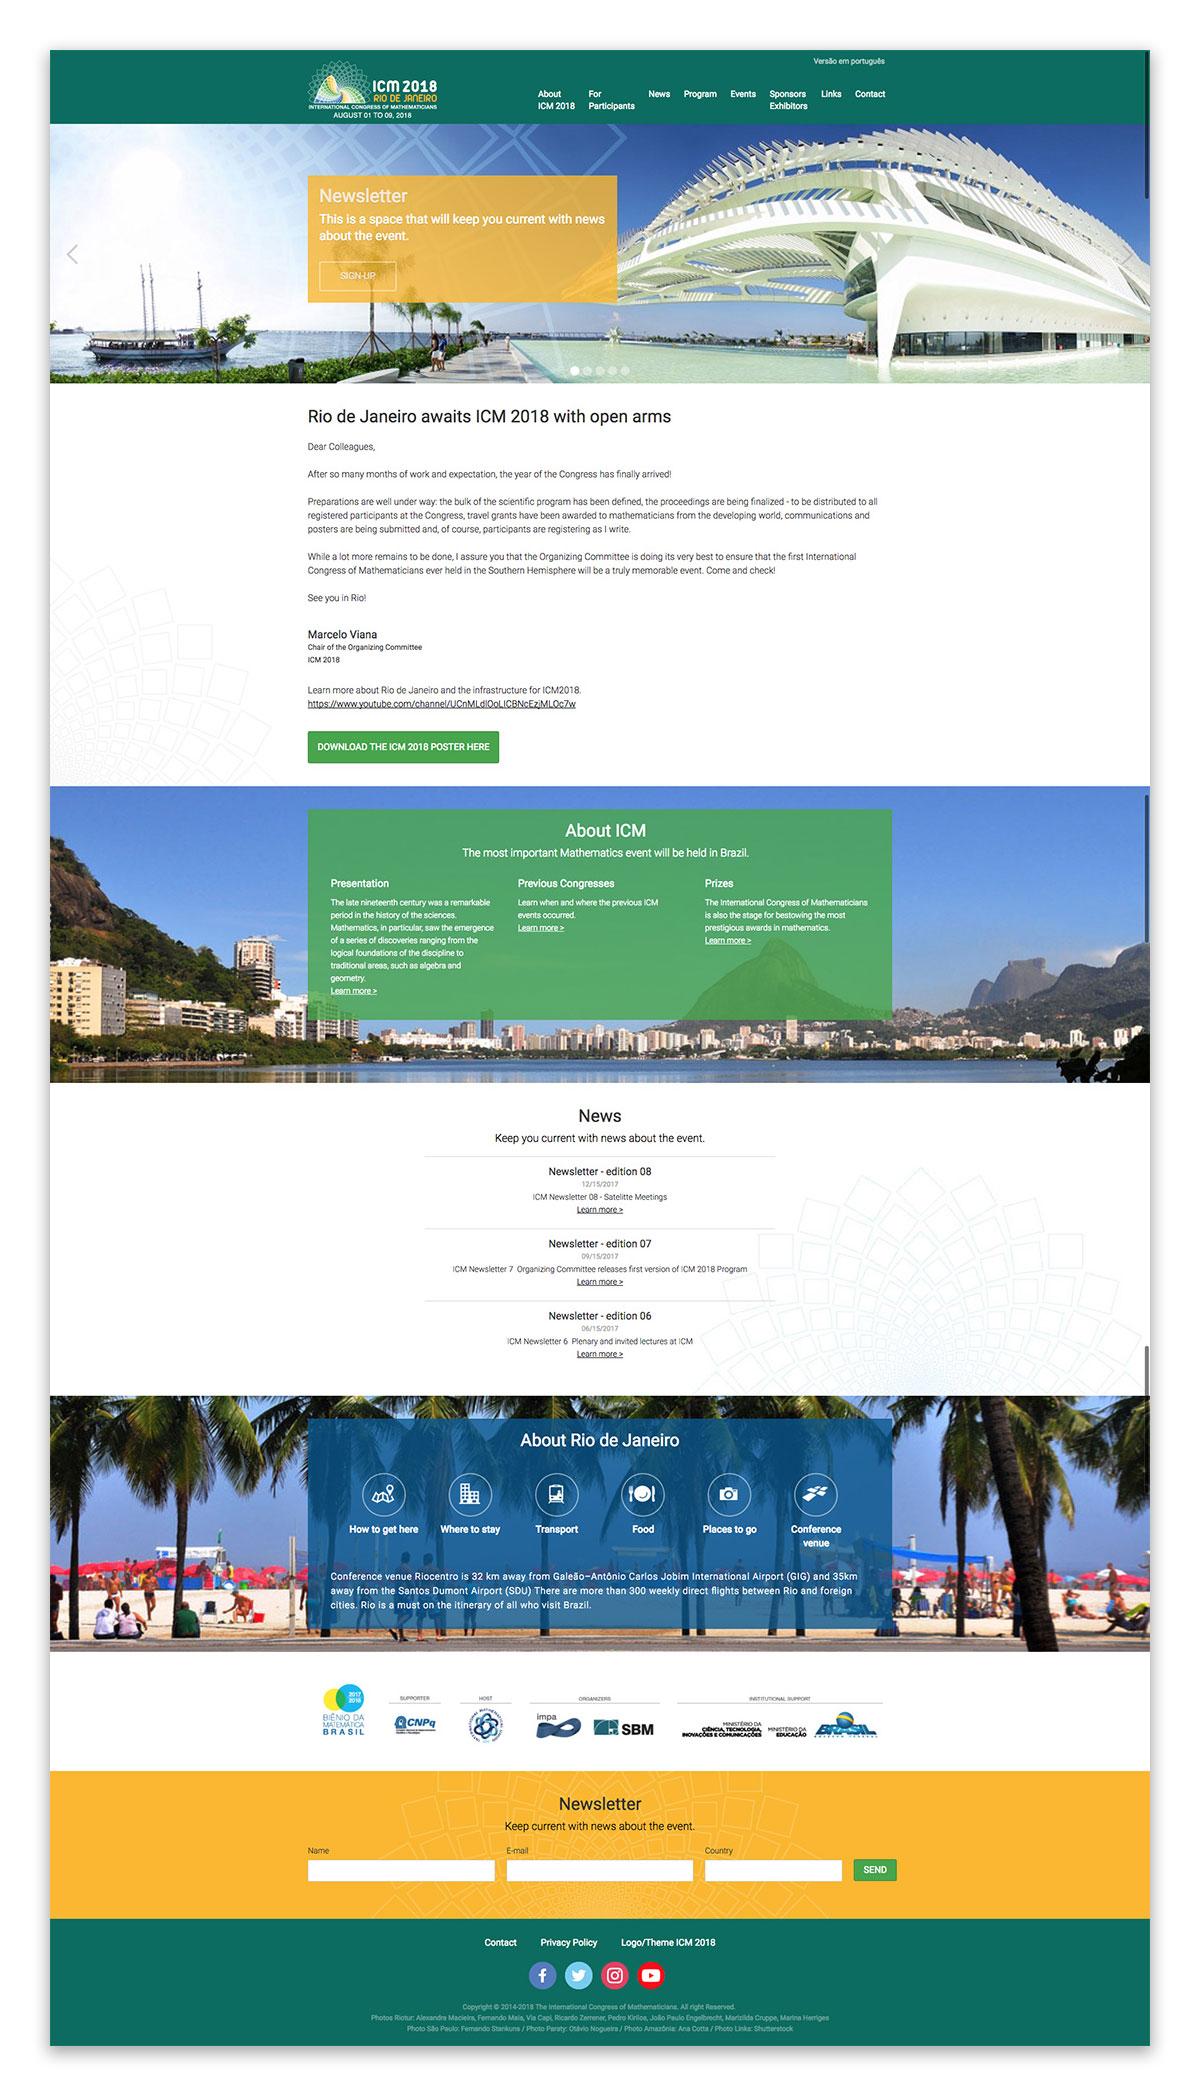 screencapture-icm2018-org-portal-en-home-1518614609936.jpg